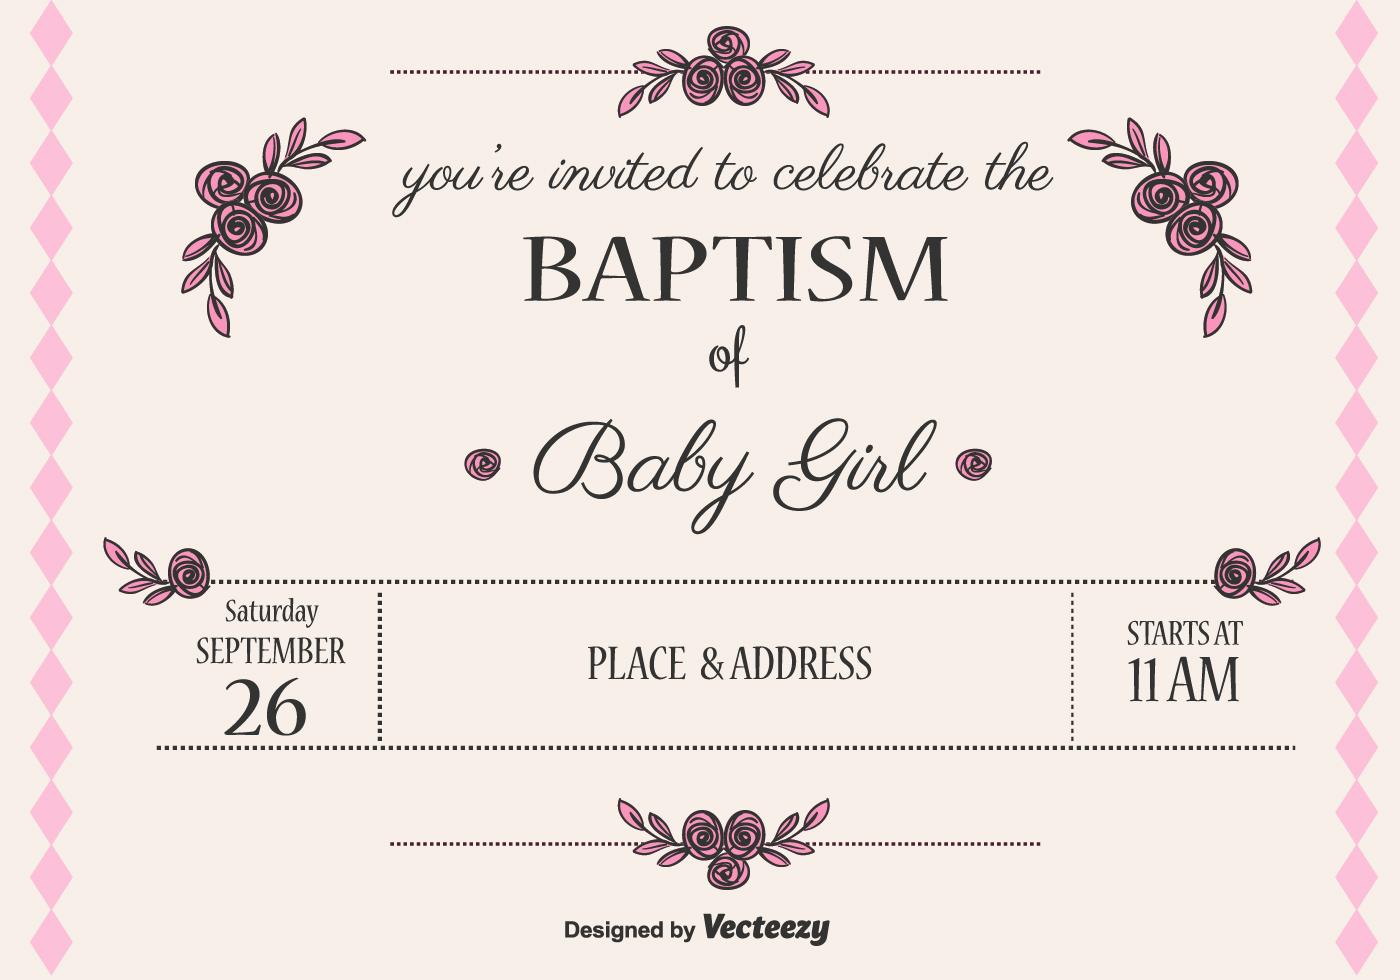 Invitation Card Christening Boy